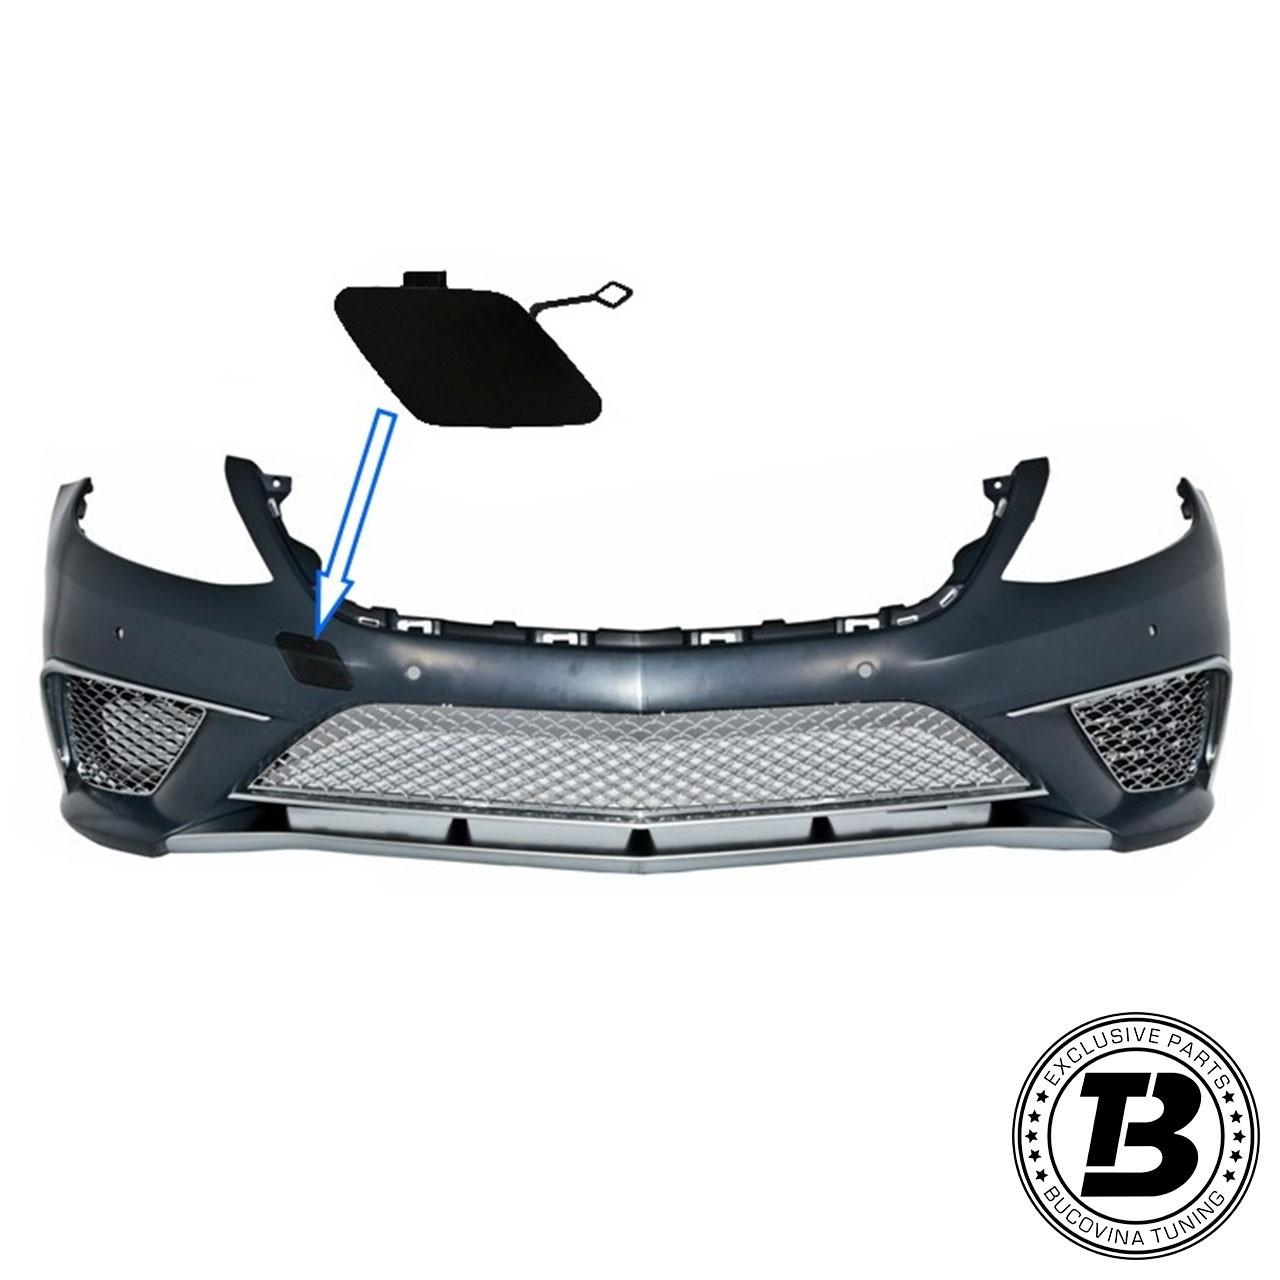 Capac carlig de remorcare Bara Fata Mercedes S-Class W222 (13-17) S63 / S65 Design